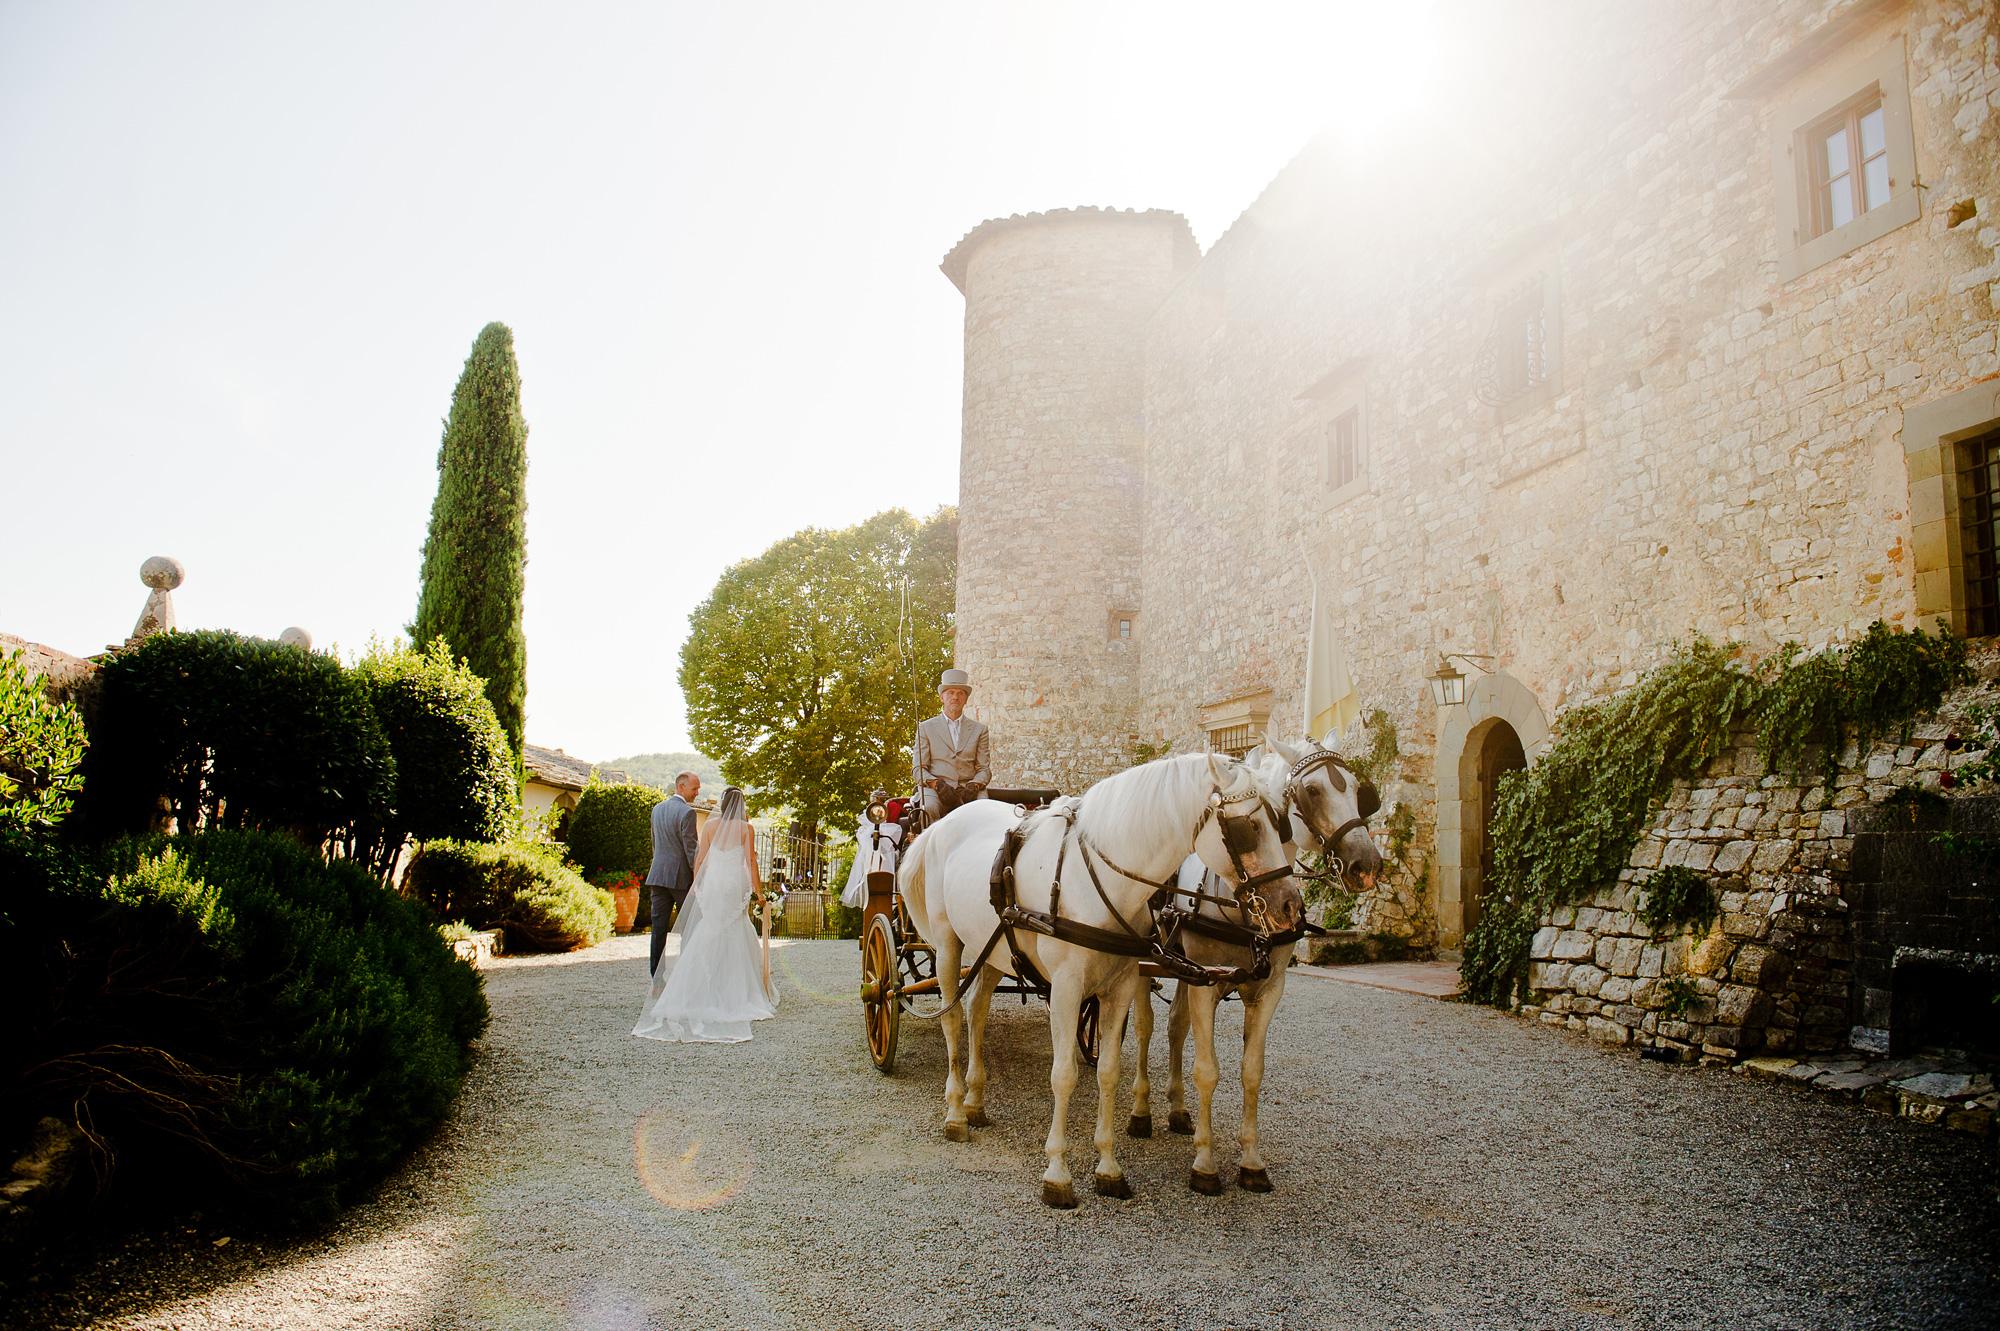 4400-castello-di-meleto-tuscany-wedding-moscastudio-ONLINE.jpg